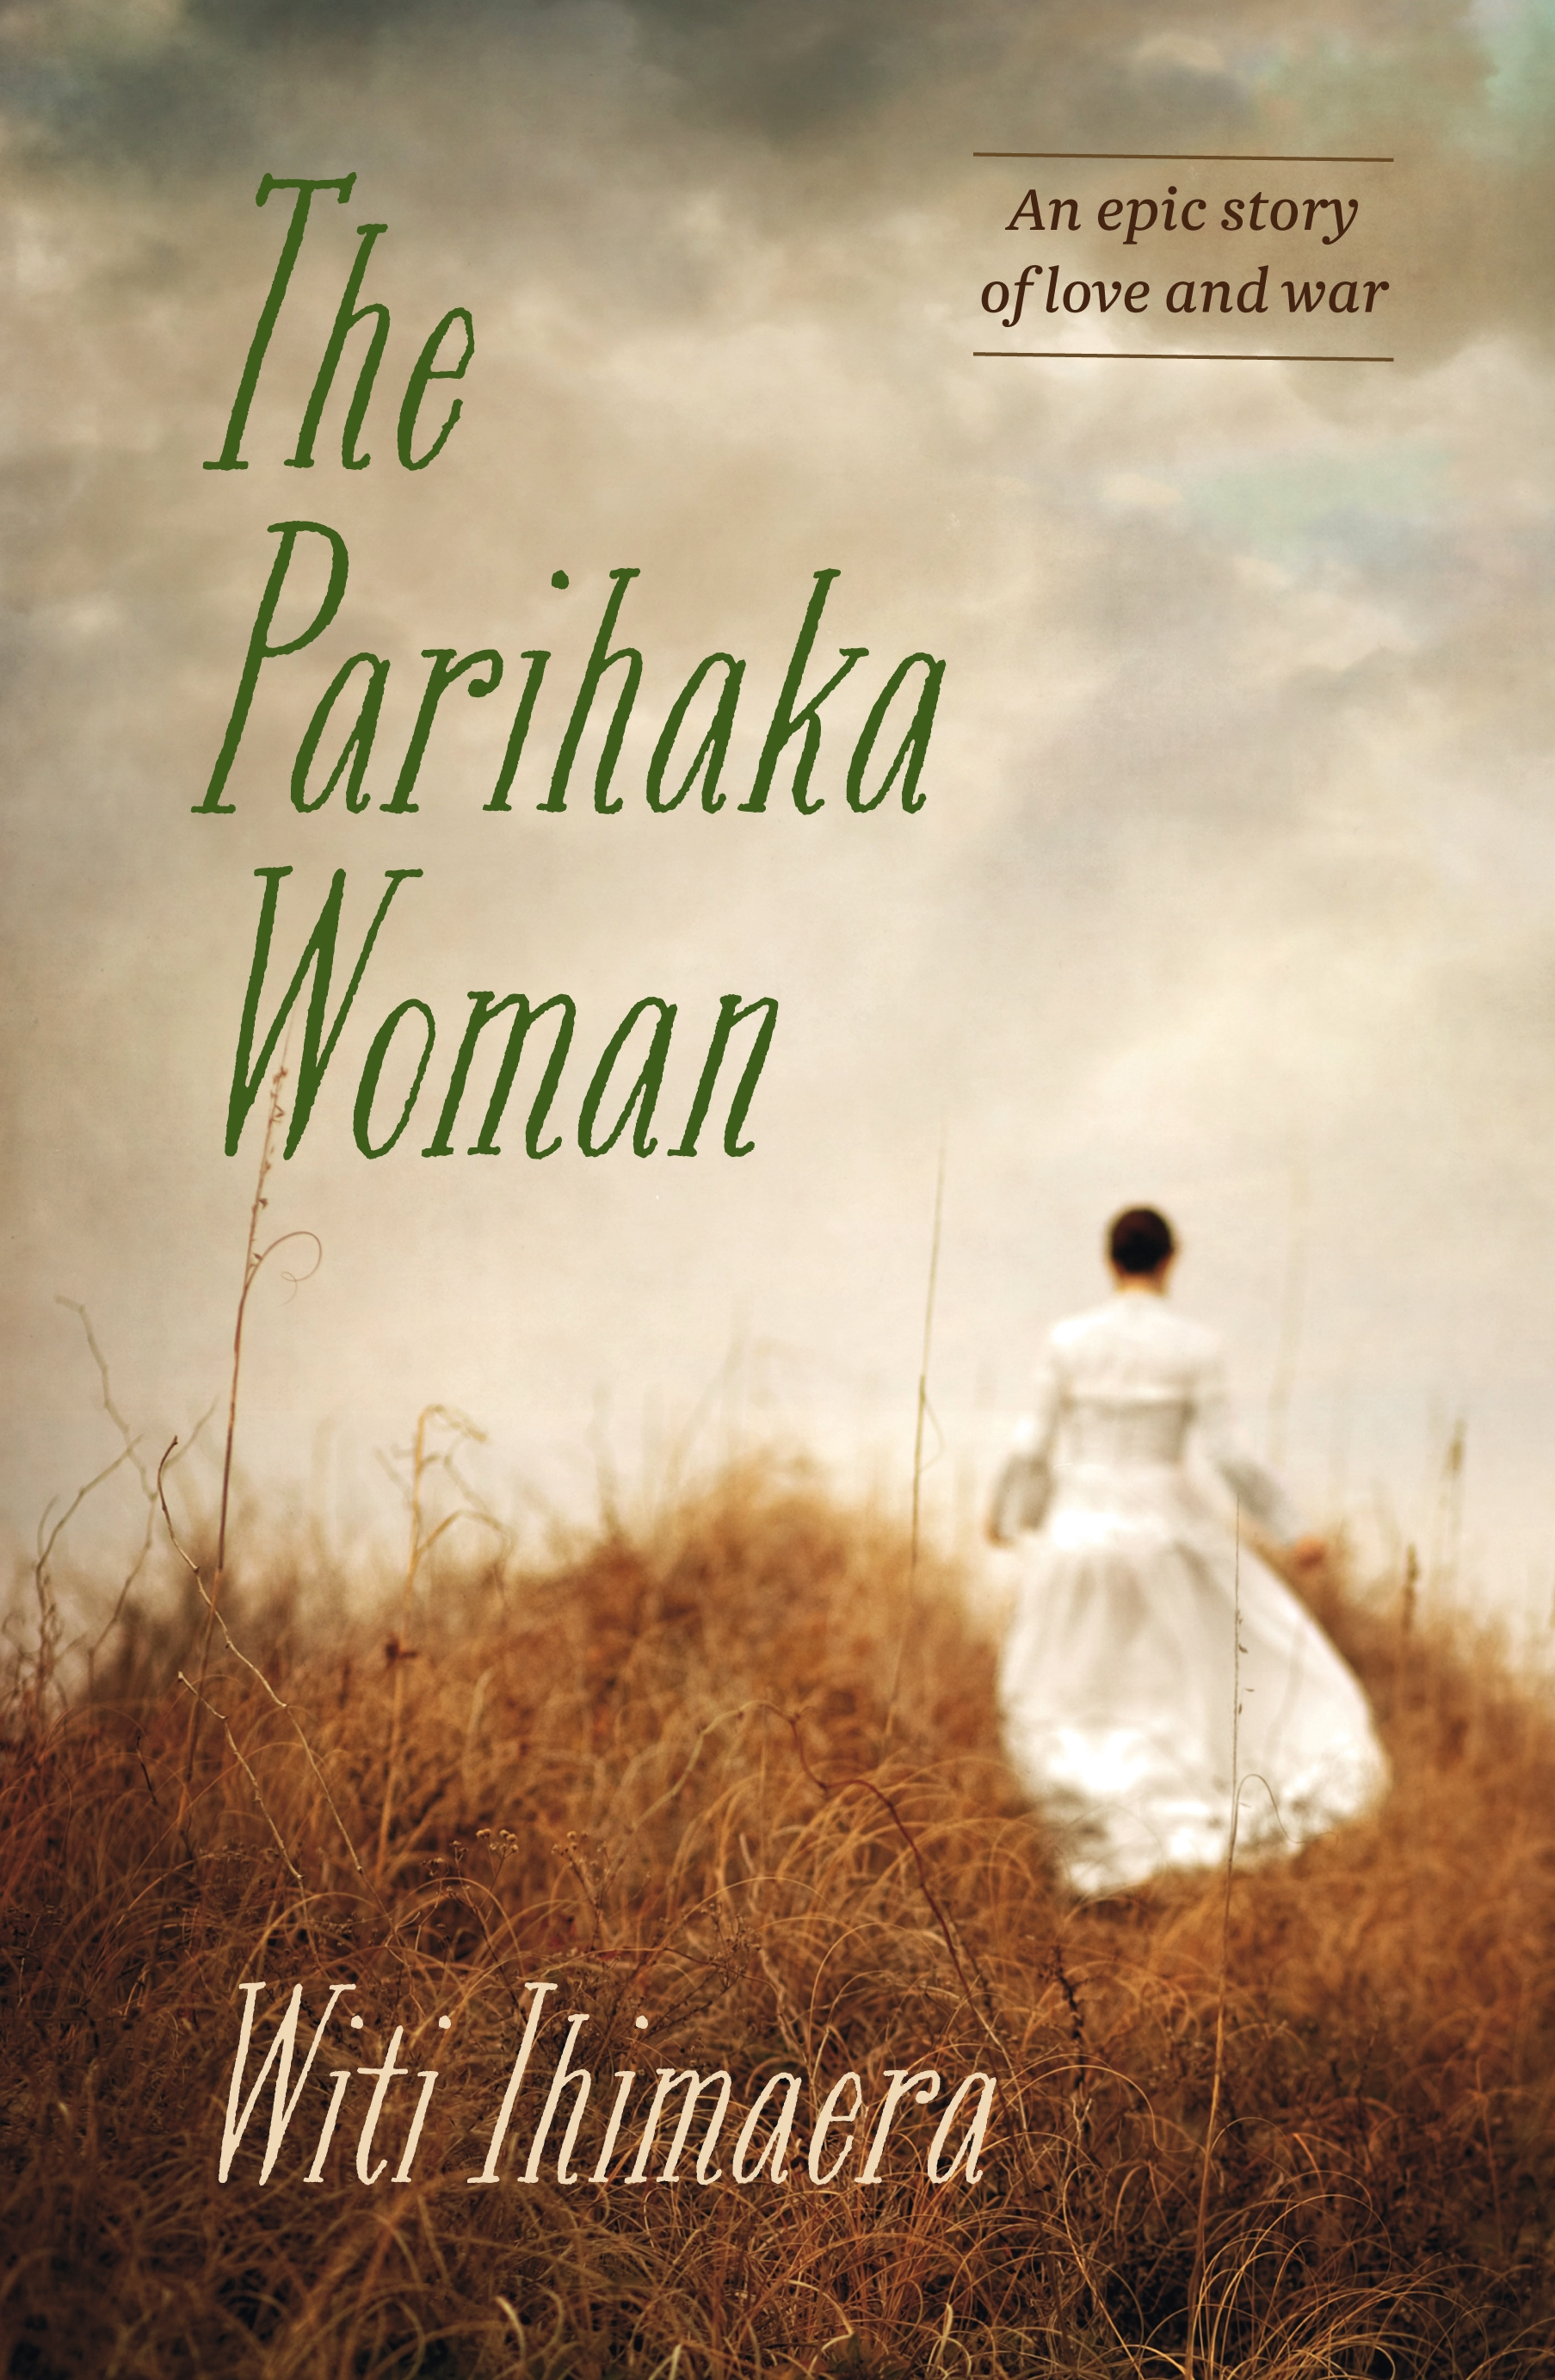 The Parihaka Woman by Witi Ihimaera - Penguin Books New Zealand